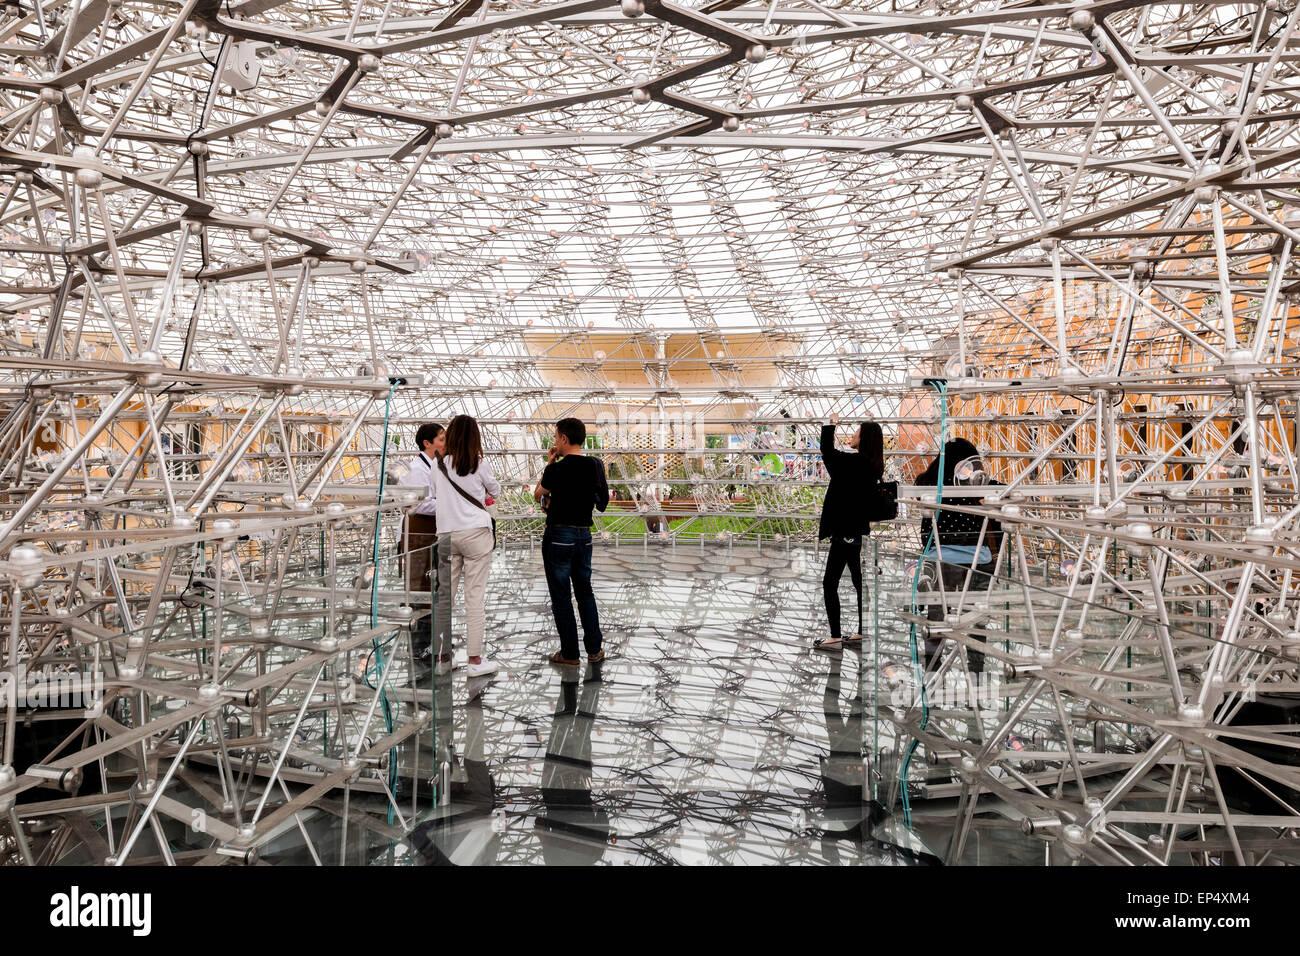 Best Stands Expo Milan : Interior pavilion platform milan expo uk